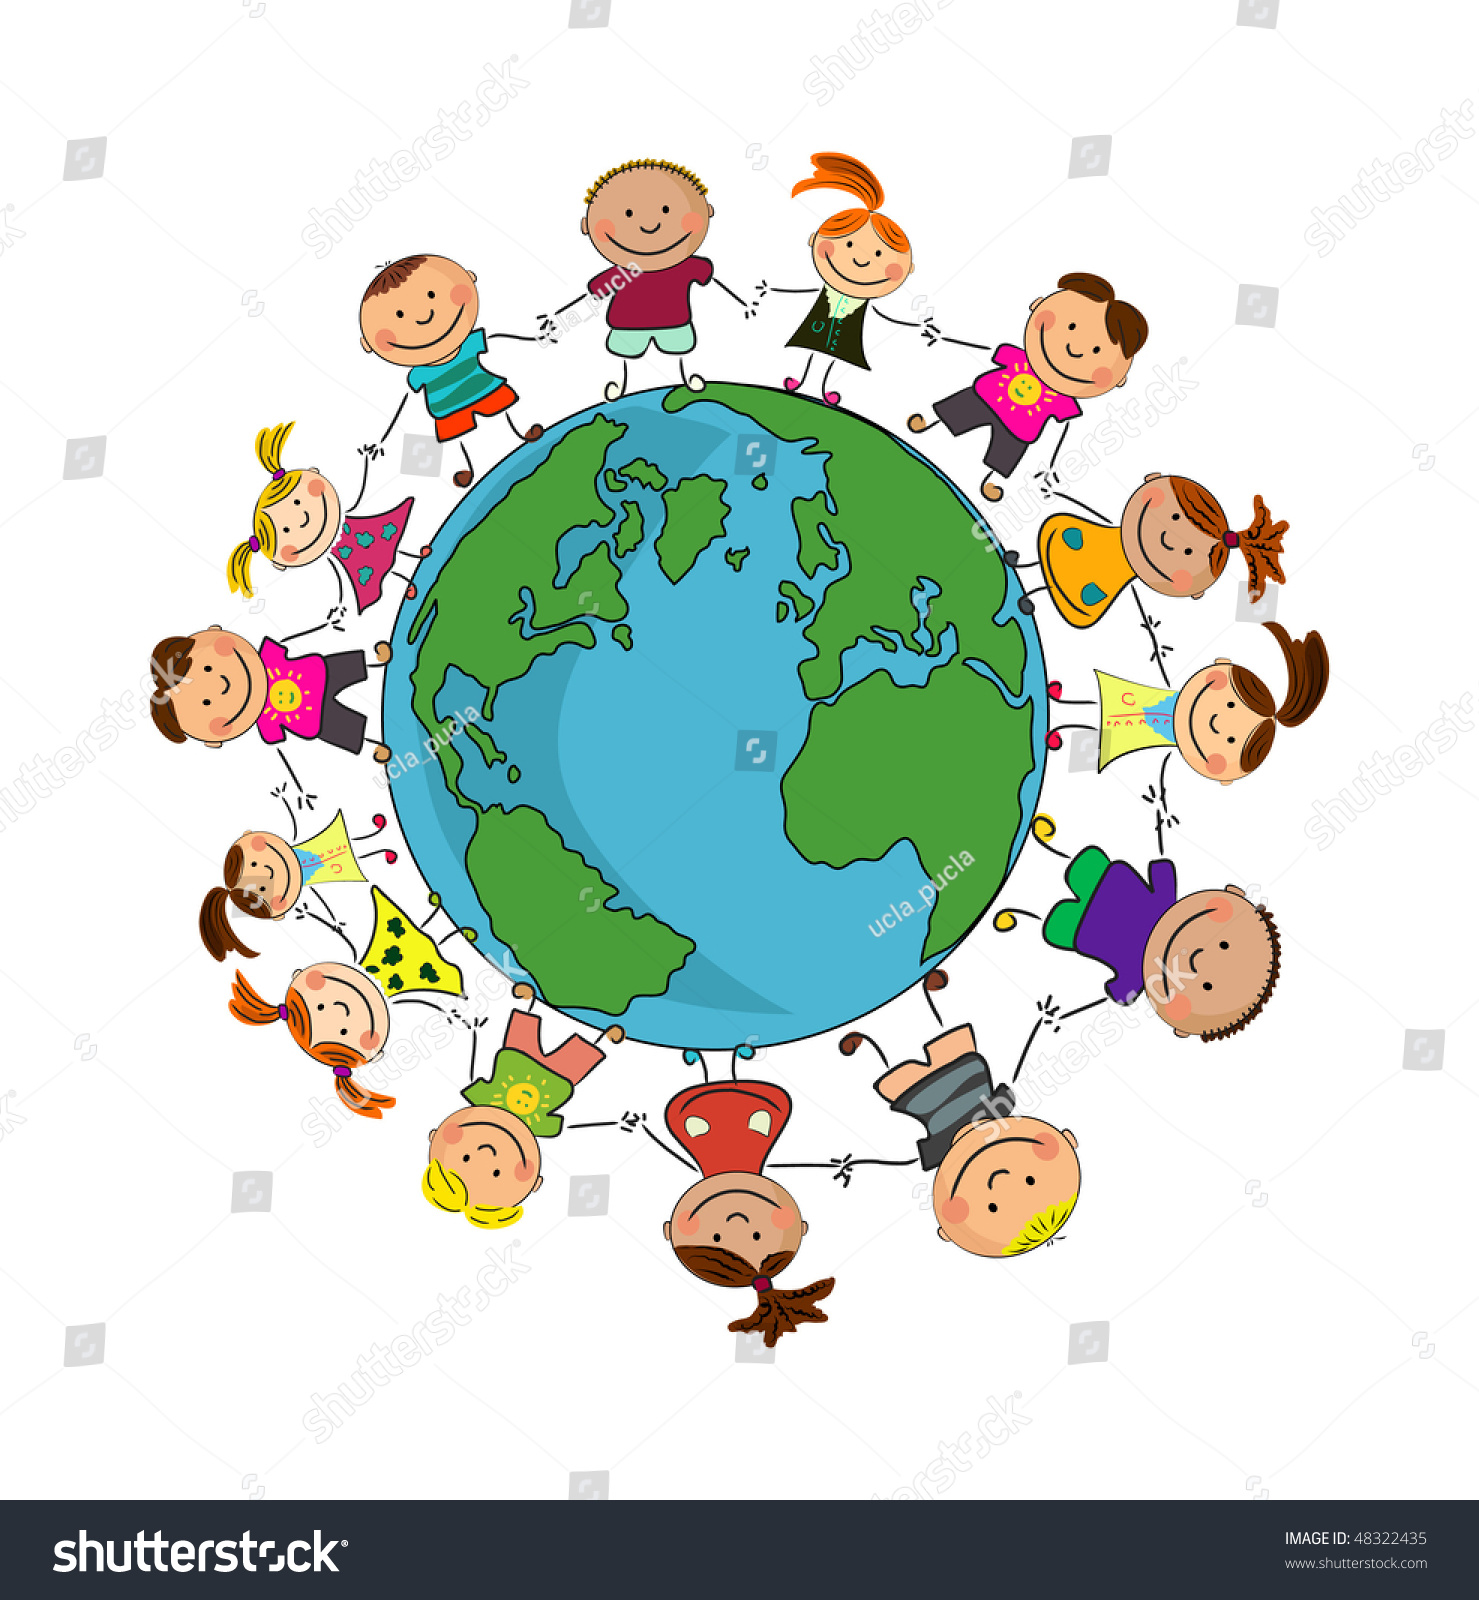 Kids Around World Stock Vector 48322435 - Shutterstock